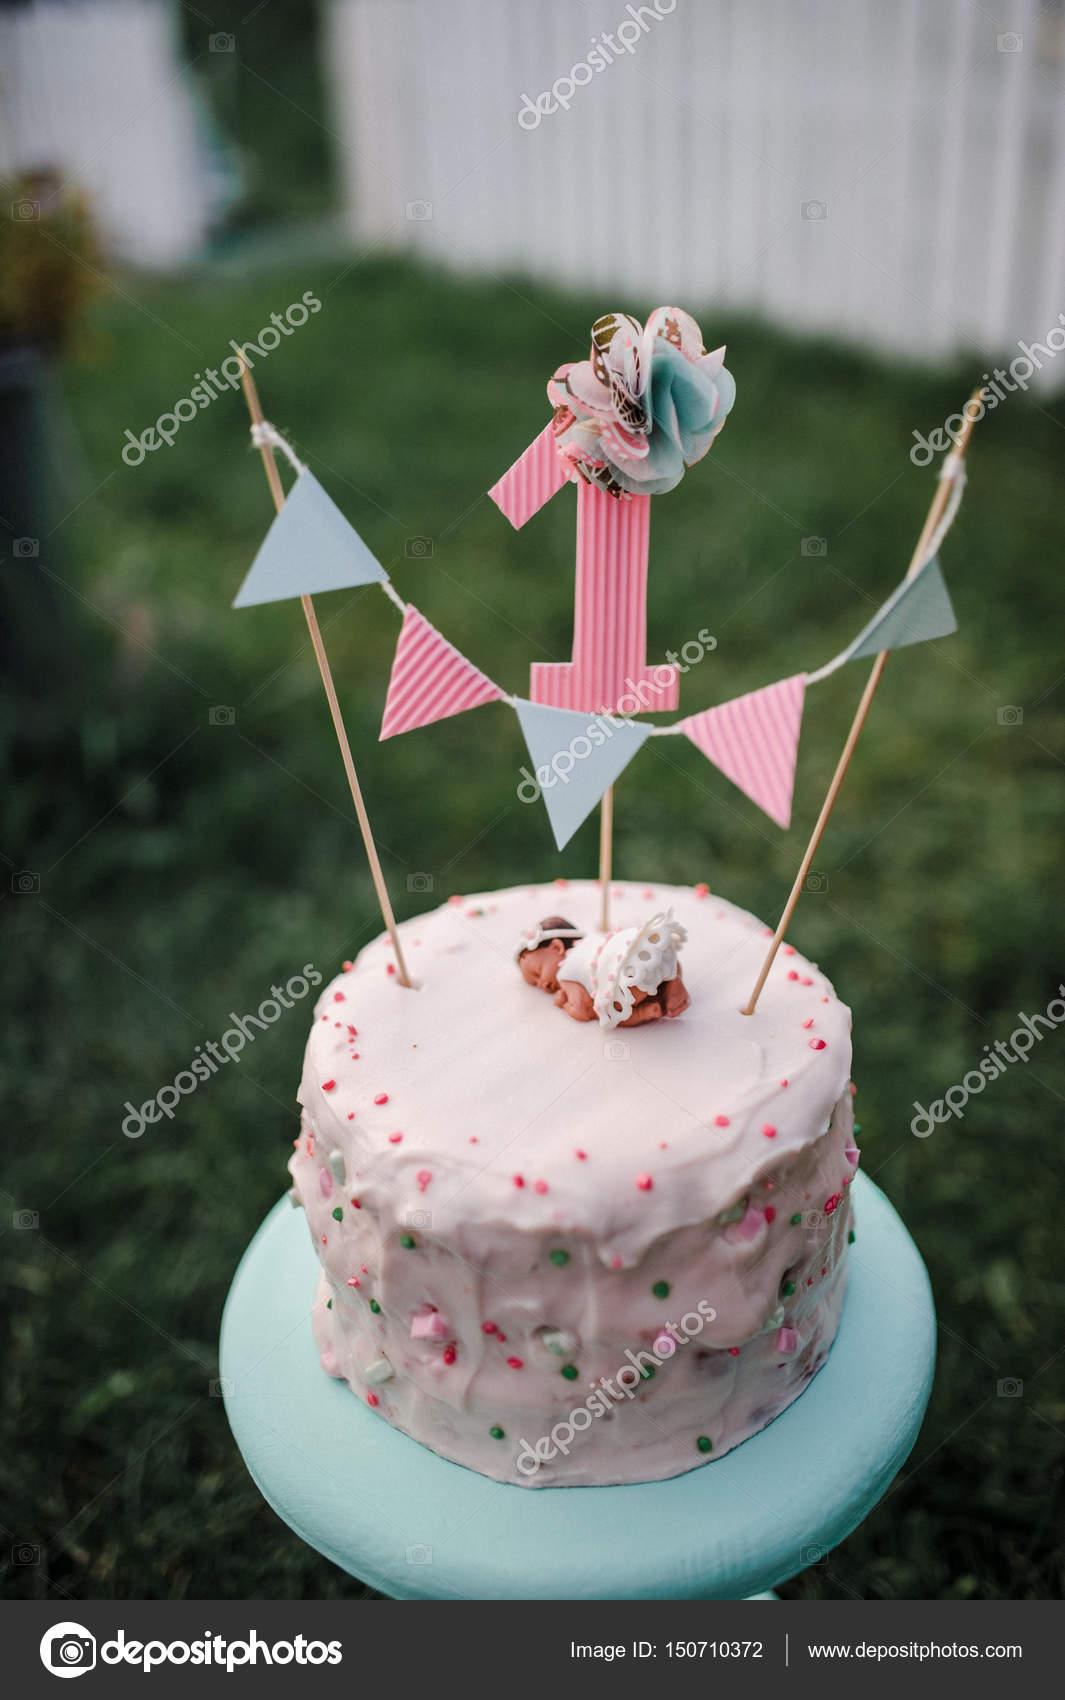 Strange Images First Birthday Cake For Girl A Birthday Cake For The Funny Birthday Cards Online Necthendildamsfinfo